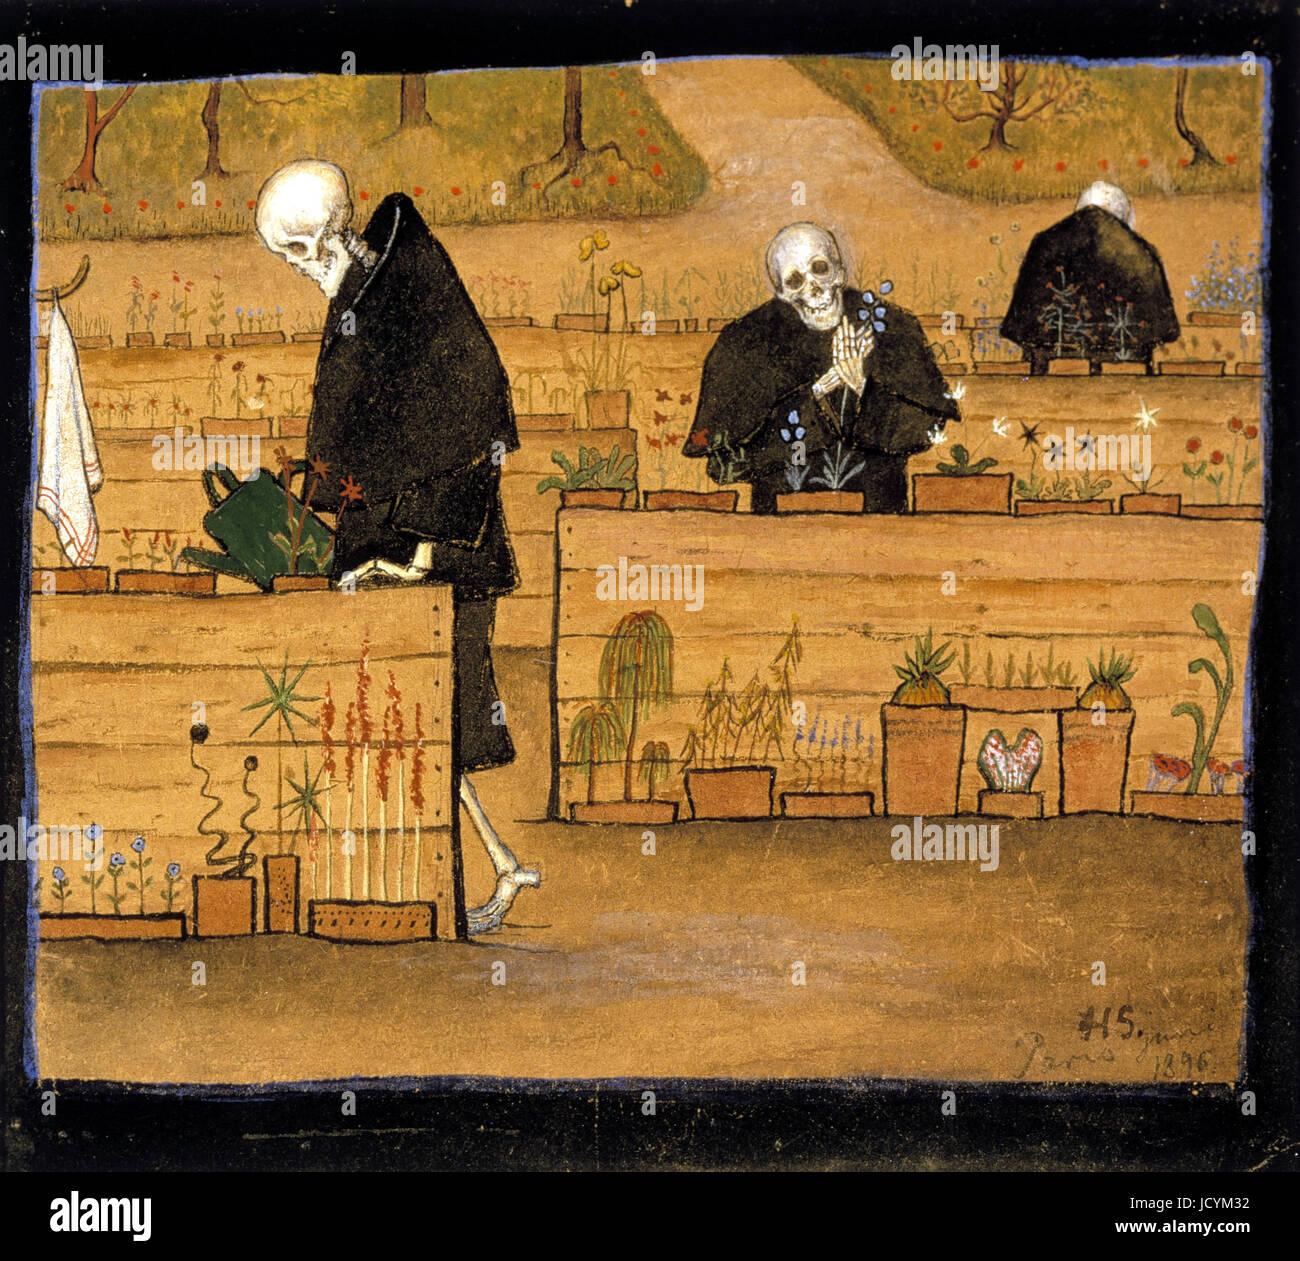 Hugo Simberg, el jardín de la muerte 1896 Óleo sobre lienzo. Acuarela, gouache. Ateneum se encuentra, Imagen De Stock